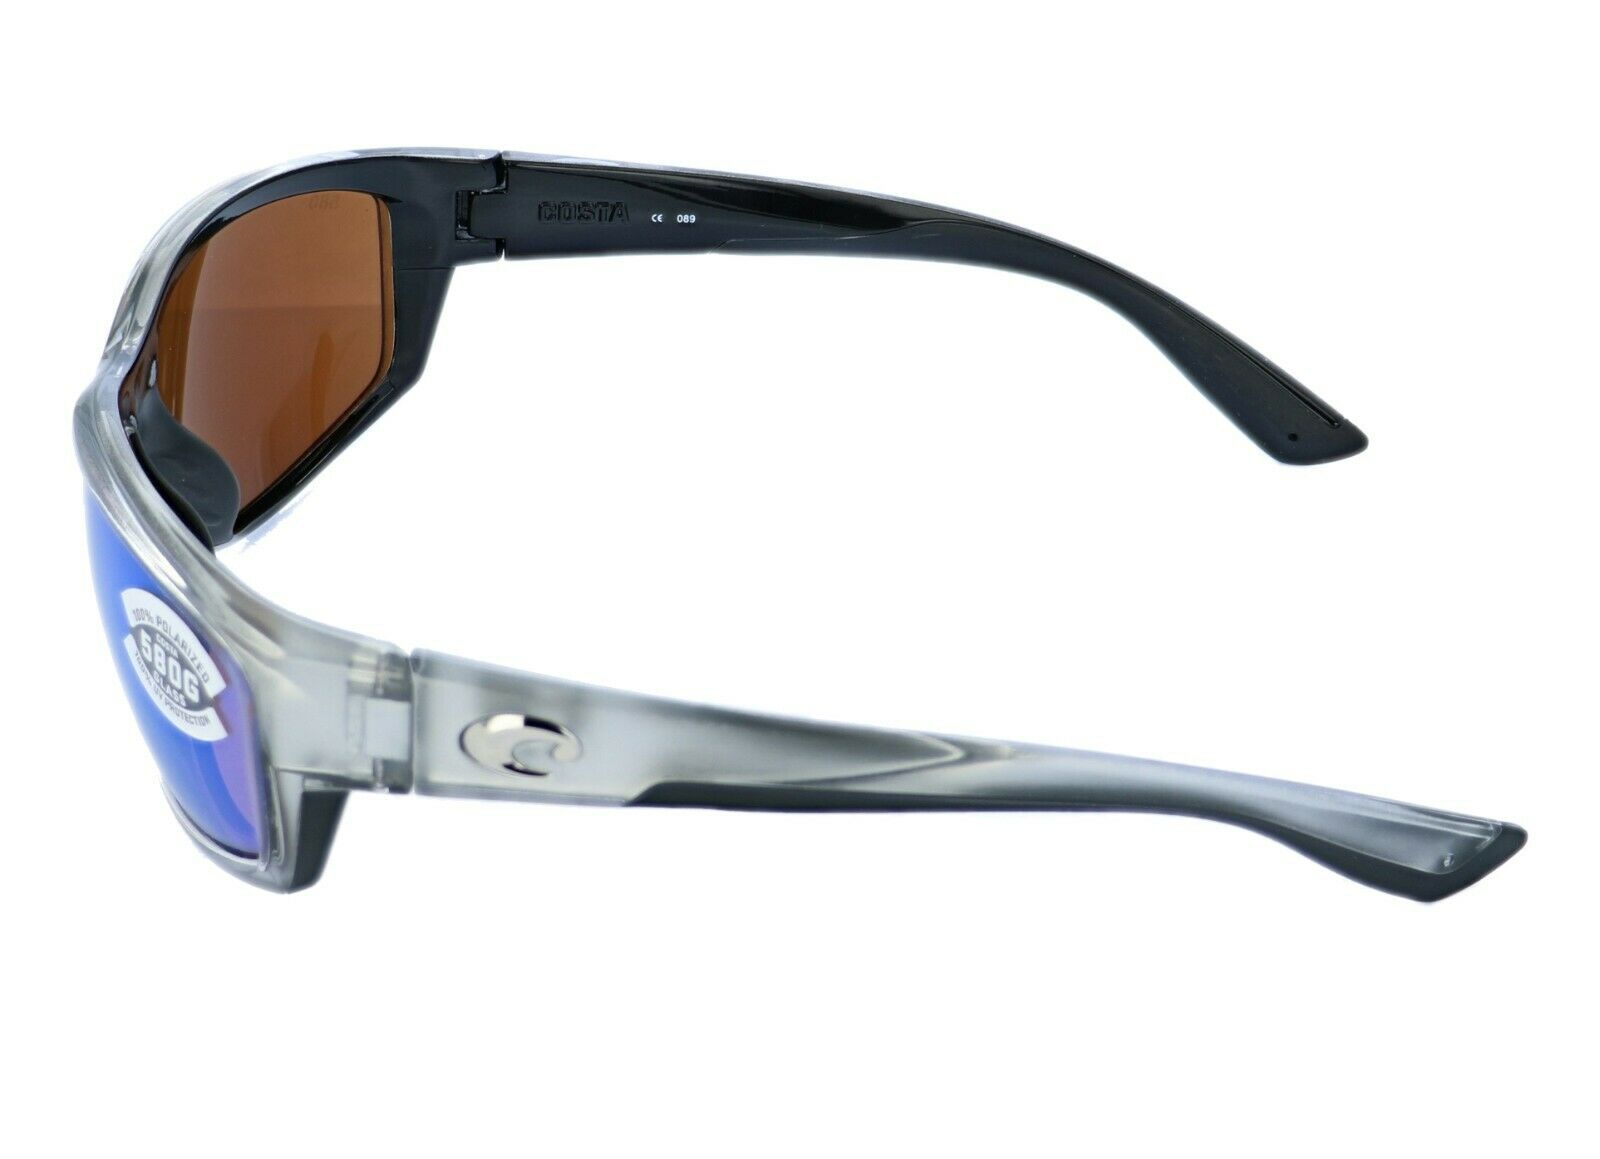 Costa Del Mar Saltbreak Sunglasses BK-18-OGMGLP SilverGreen Mirror 580G Polar